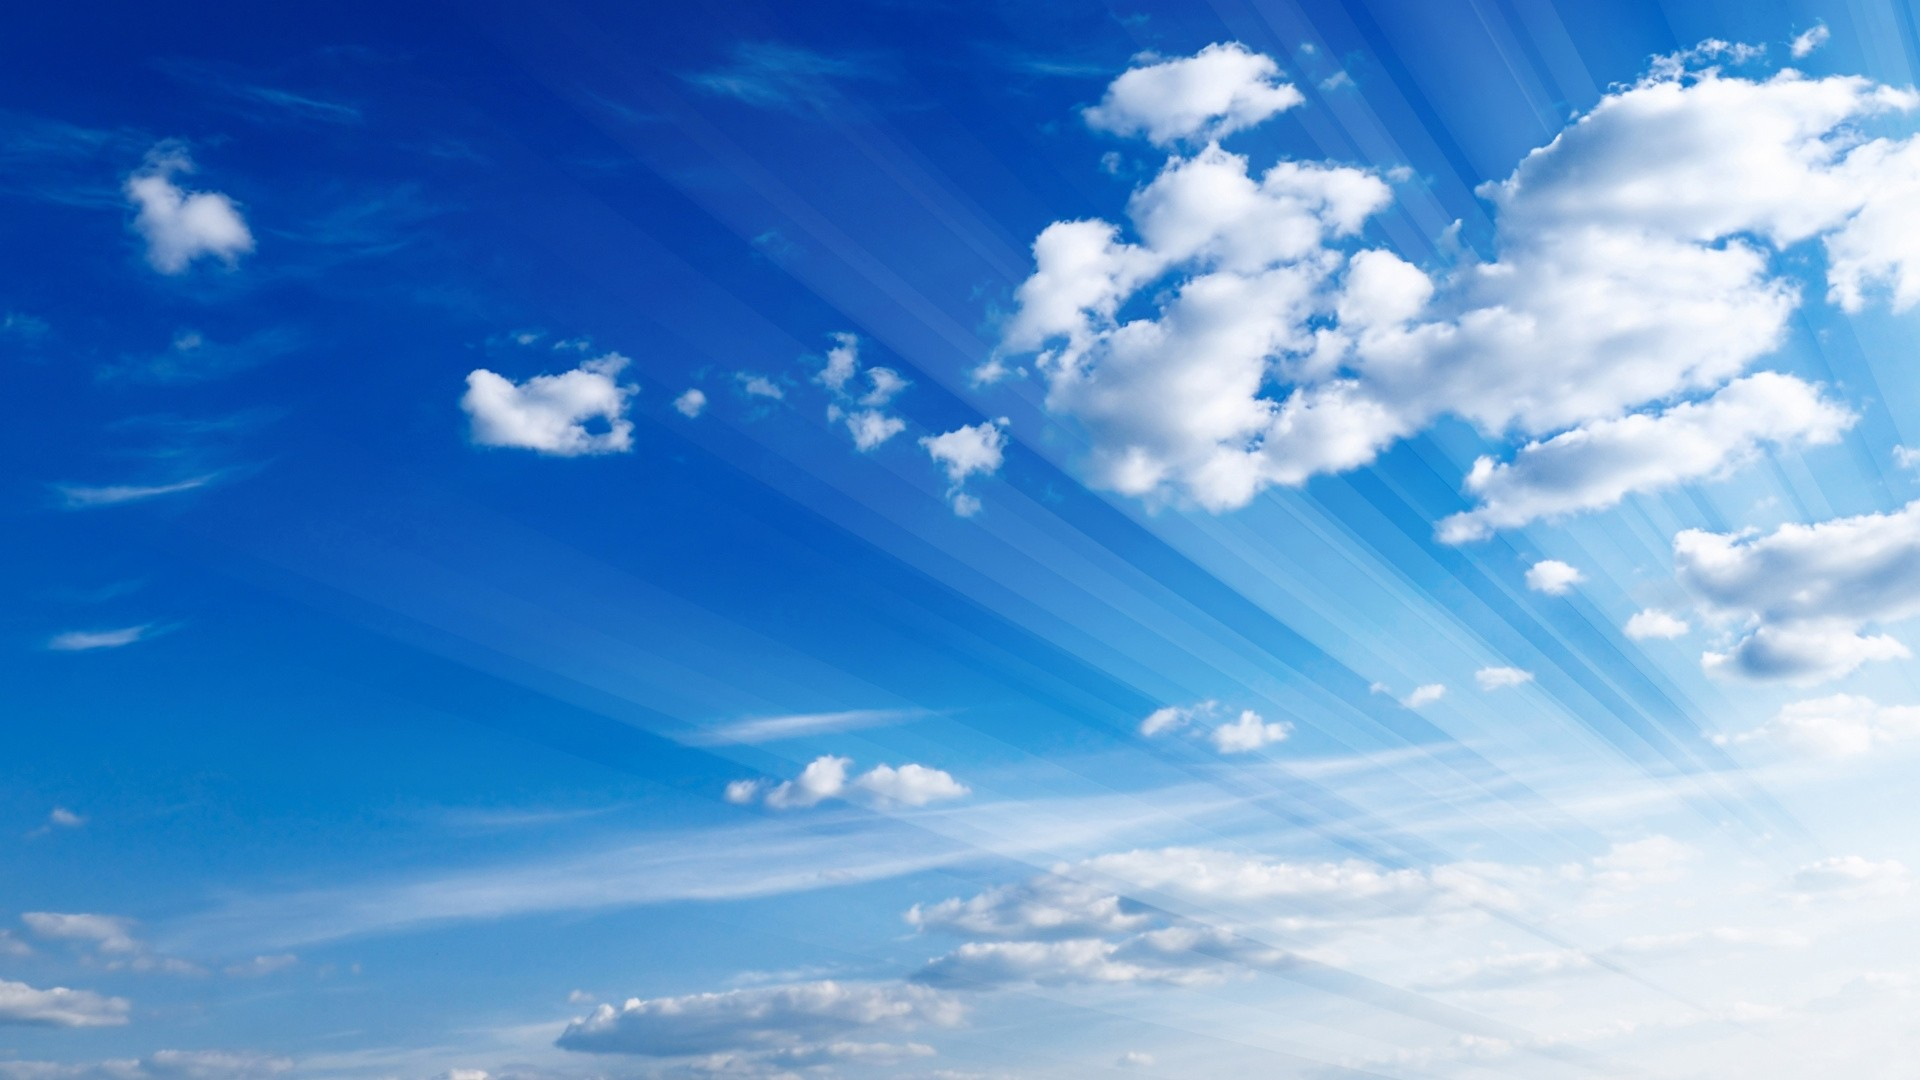 Blue Cloud Free Wallpaper